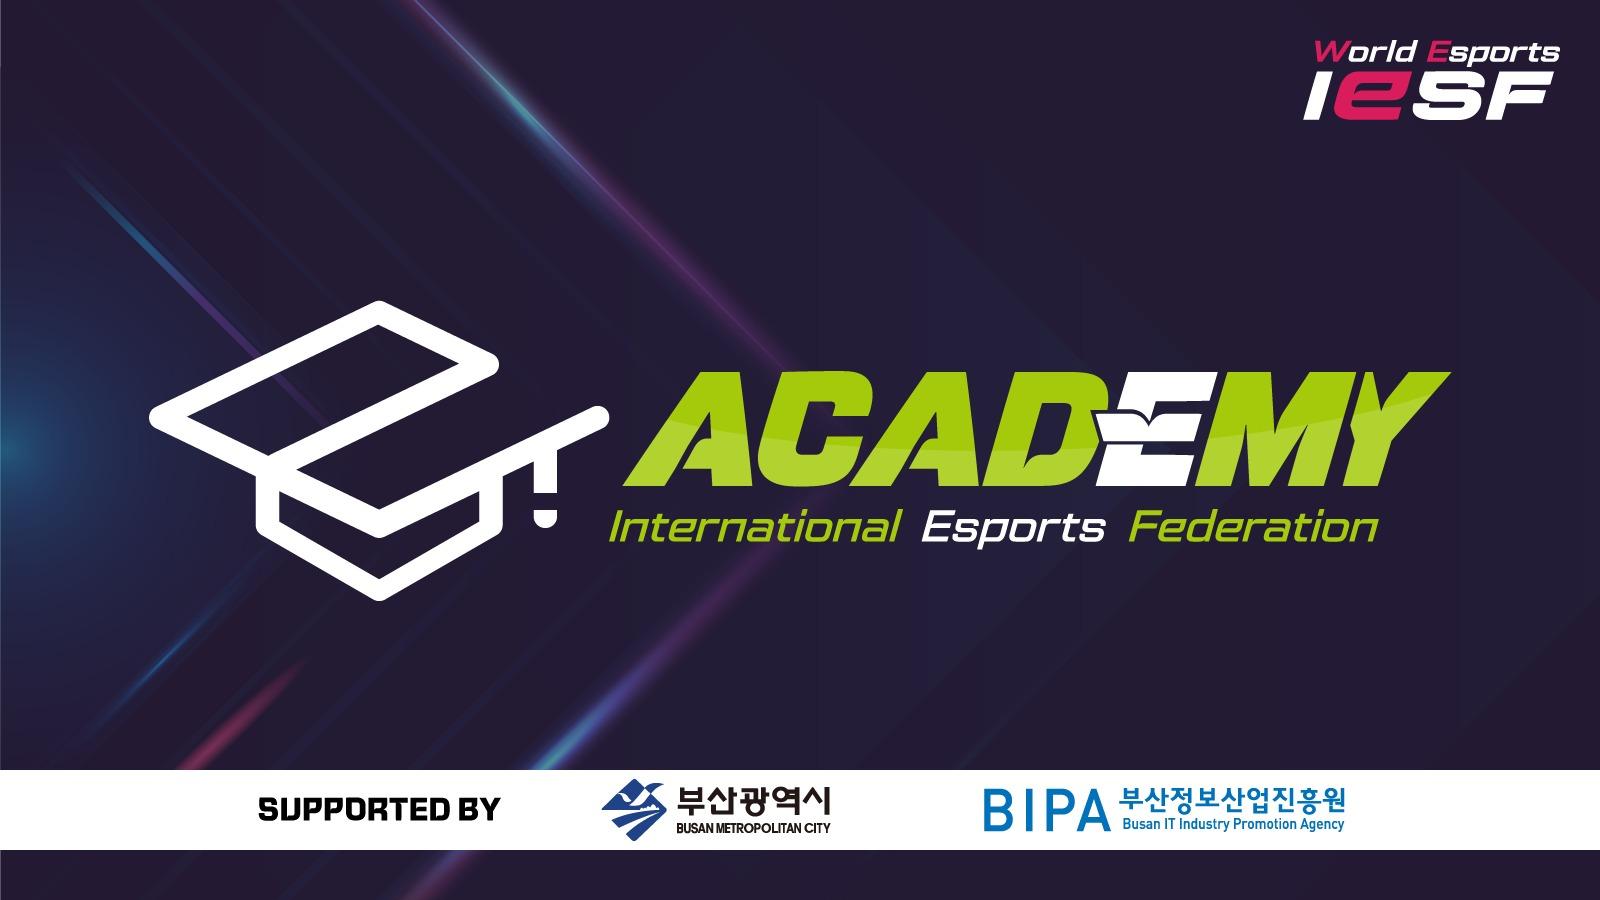 IESF RefereeAcademy